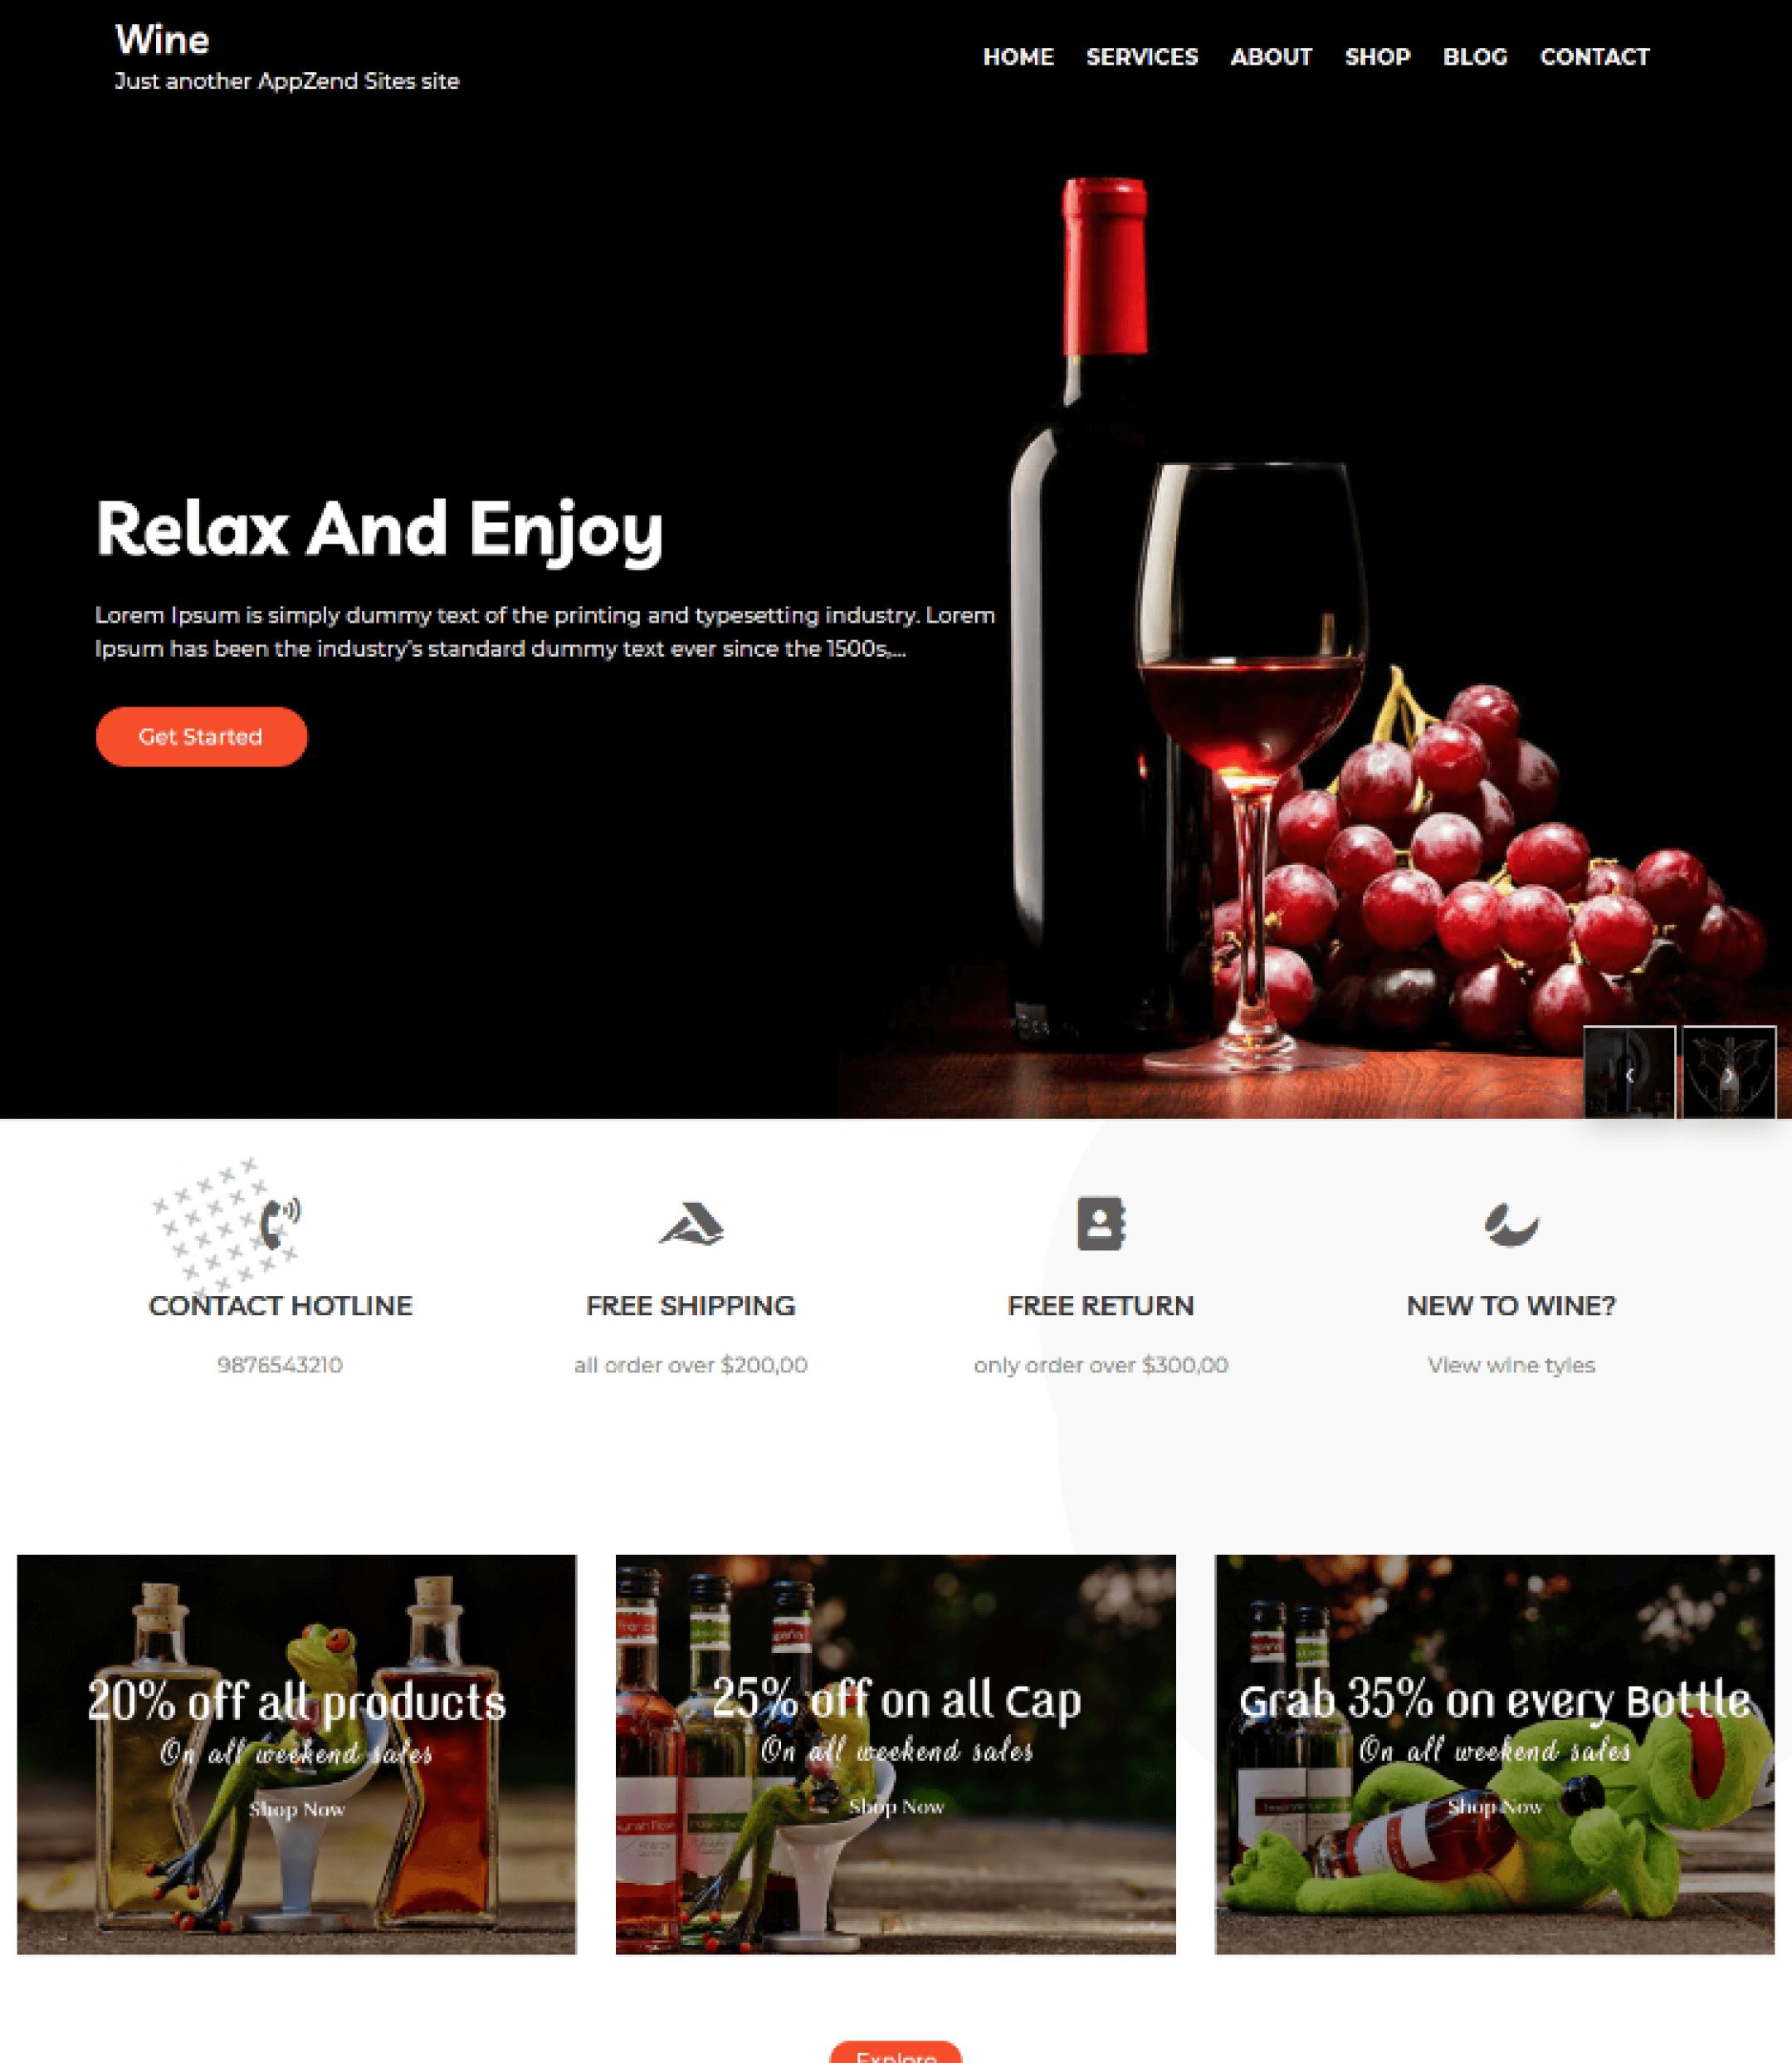 Wine - AppZend - Sparkle Themes - sparklewpthemes